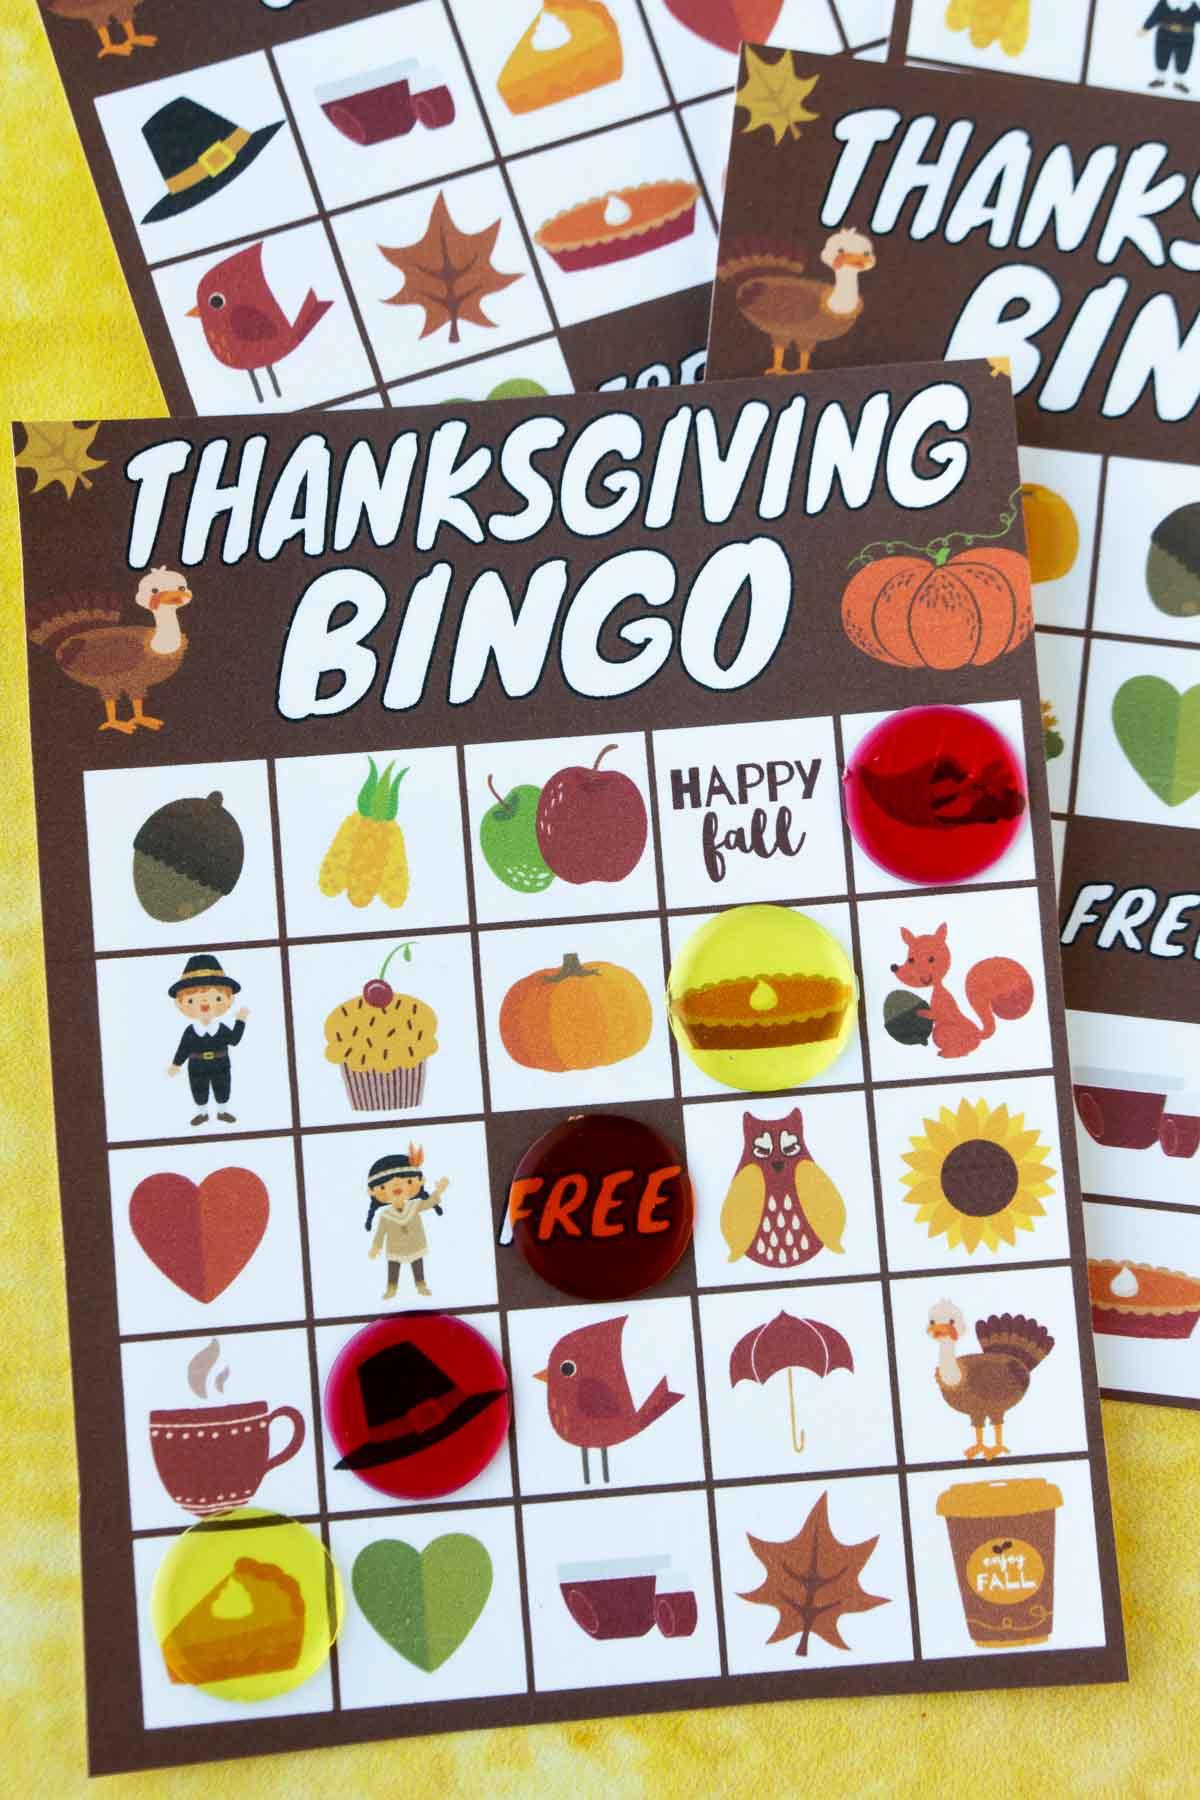 Thanksgiving bingo card with bingo markers